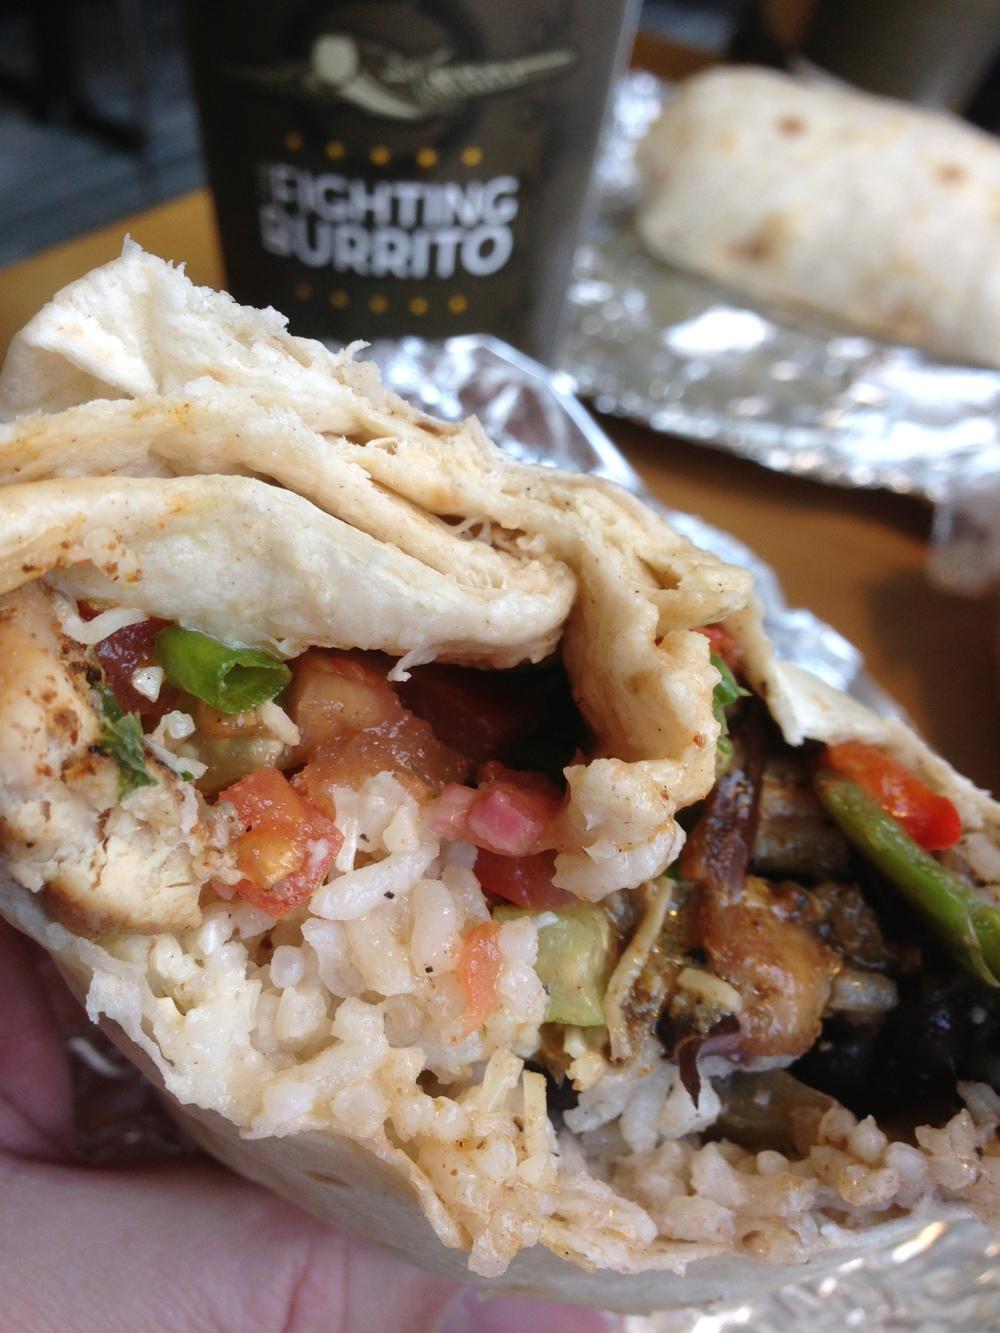 Fighting Burrito